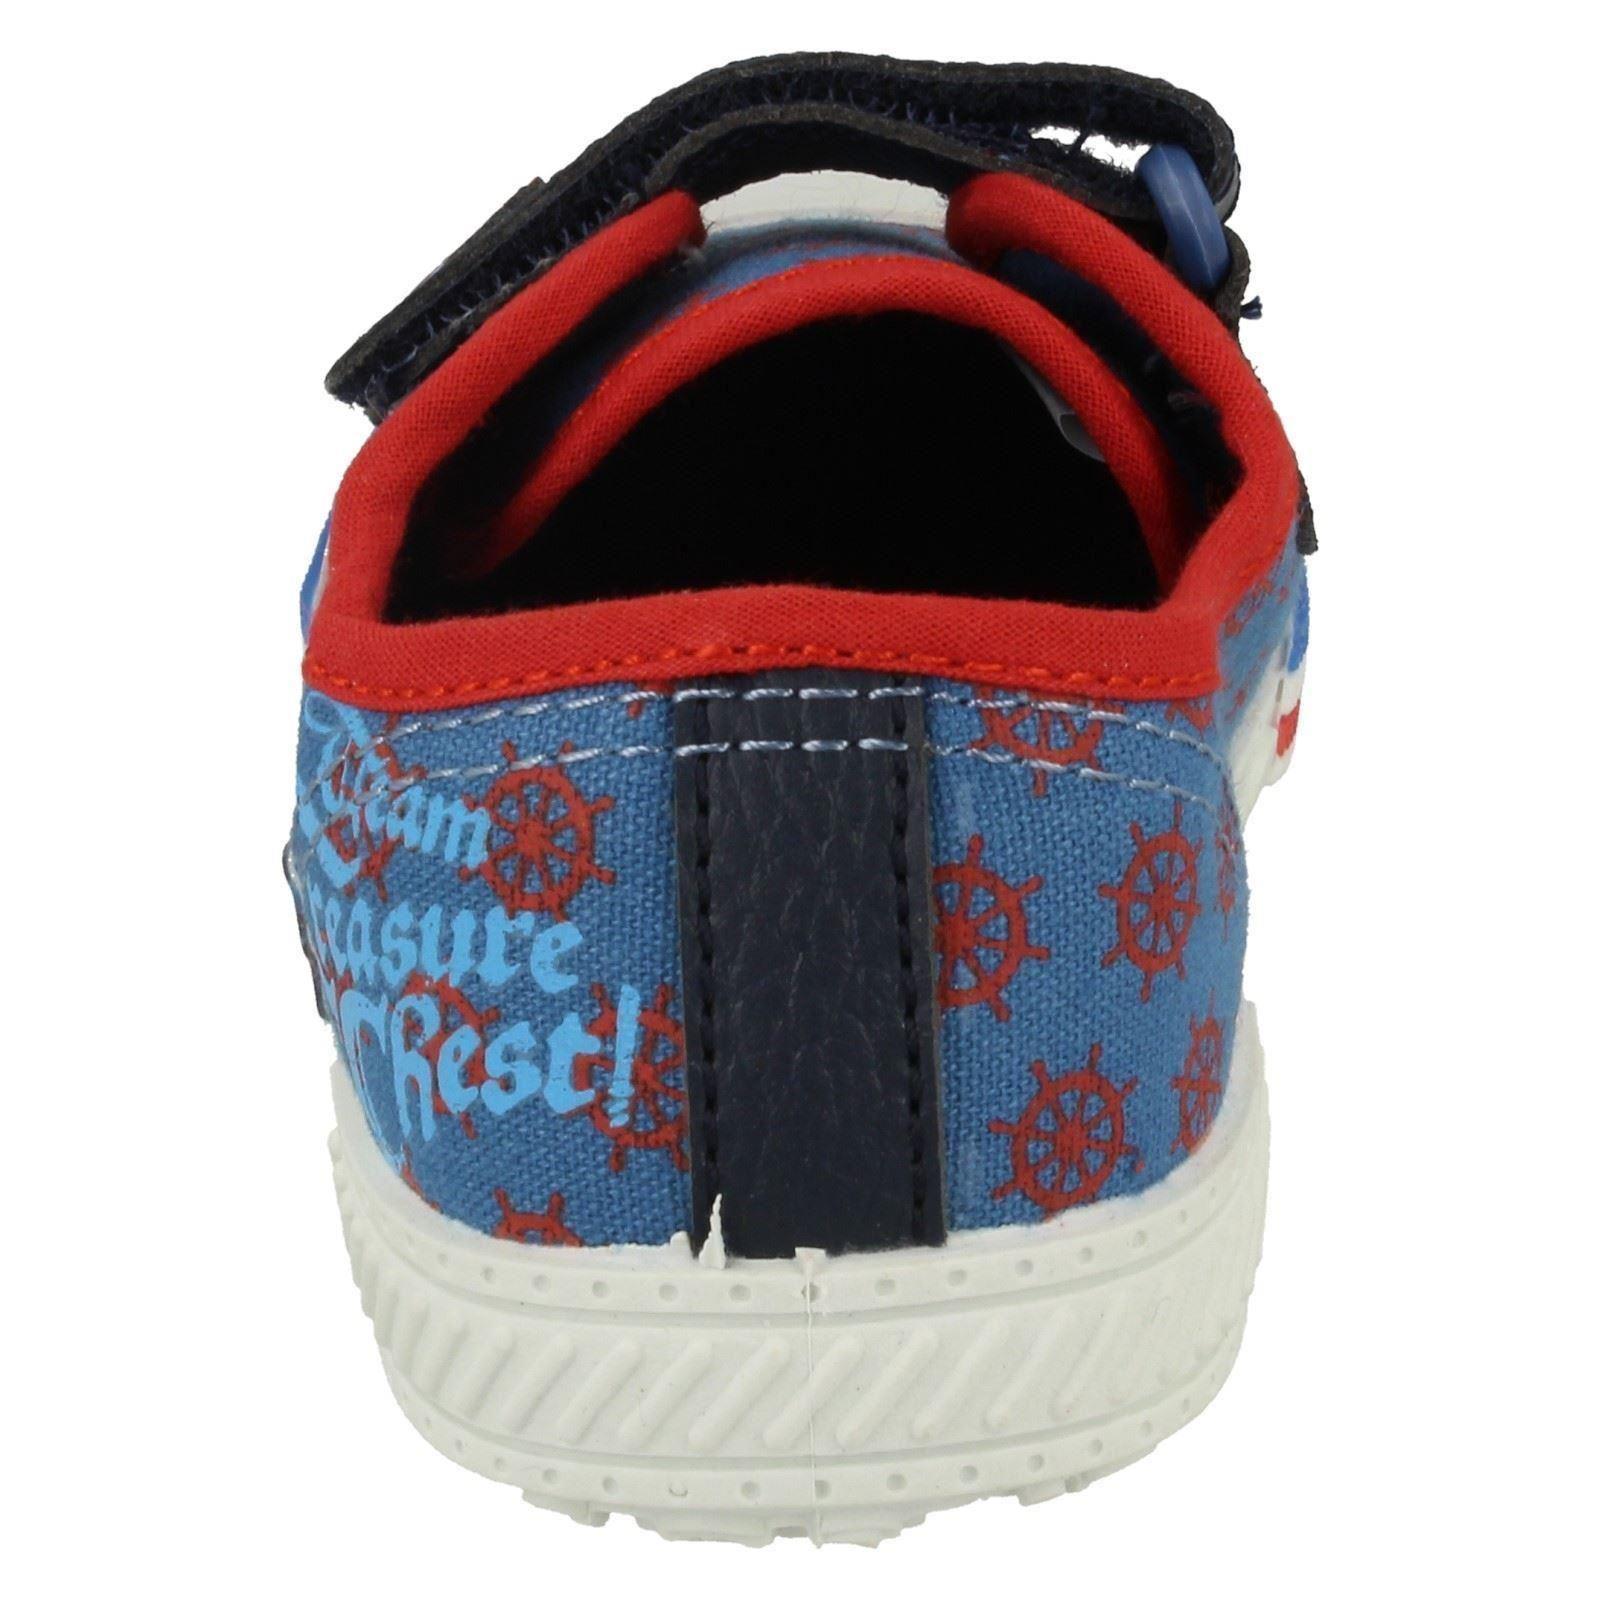 Chicos Disneys Zapatos De Lona Estilo-Jake Tesoro De Lona